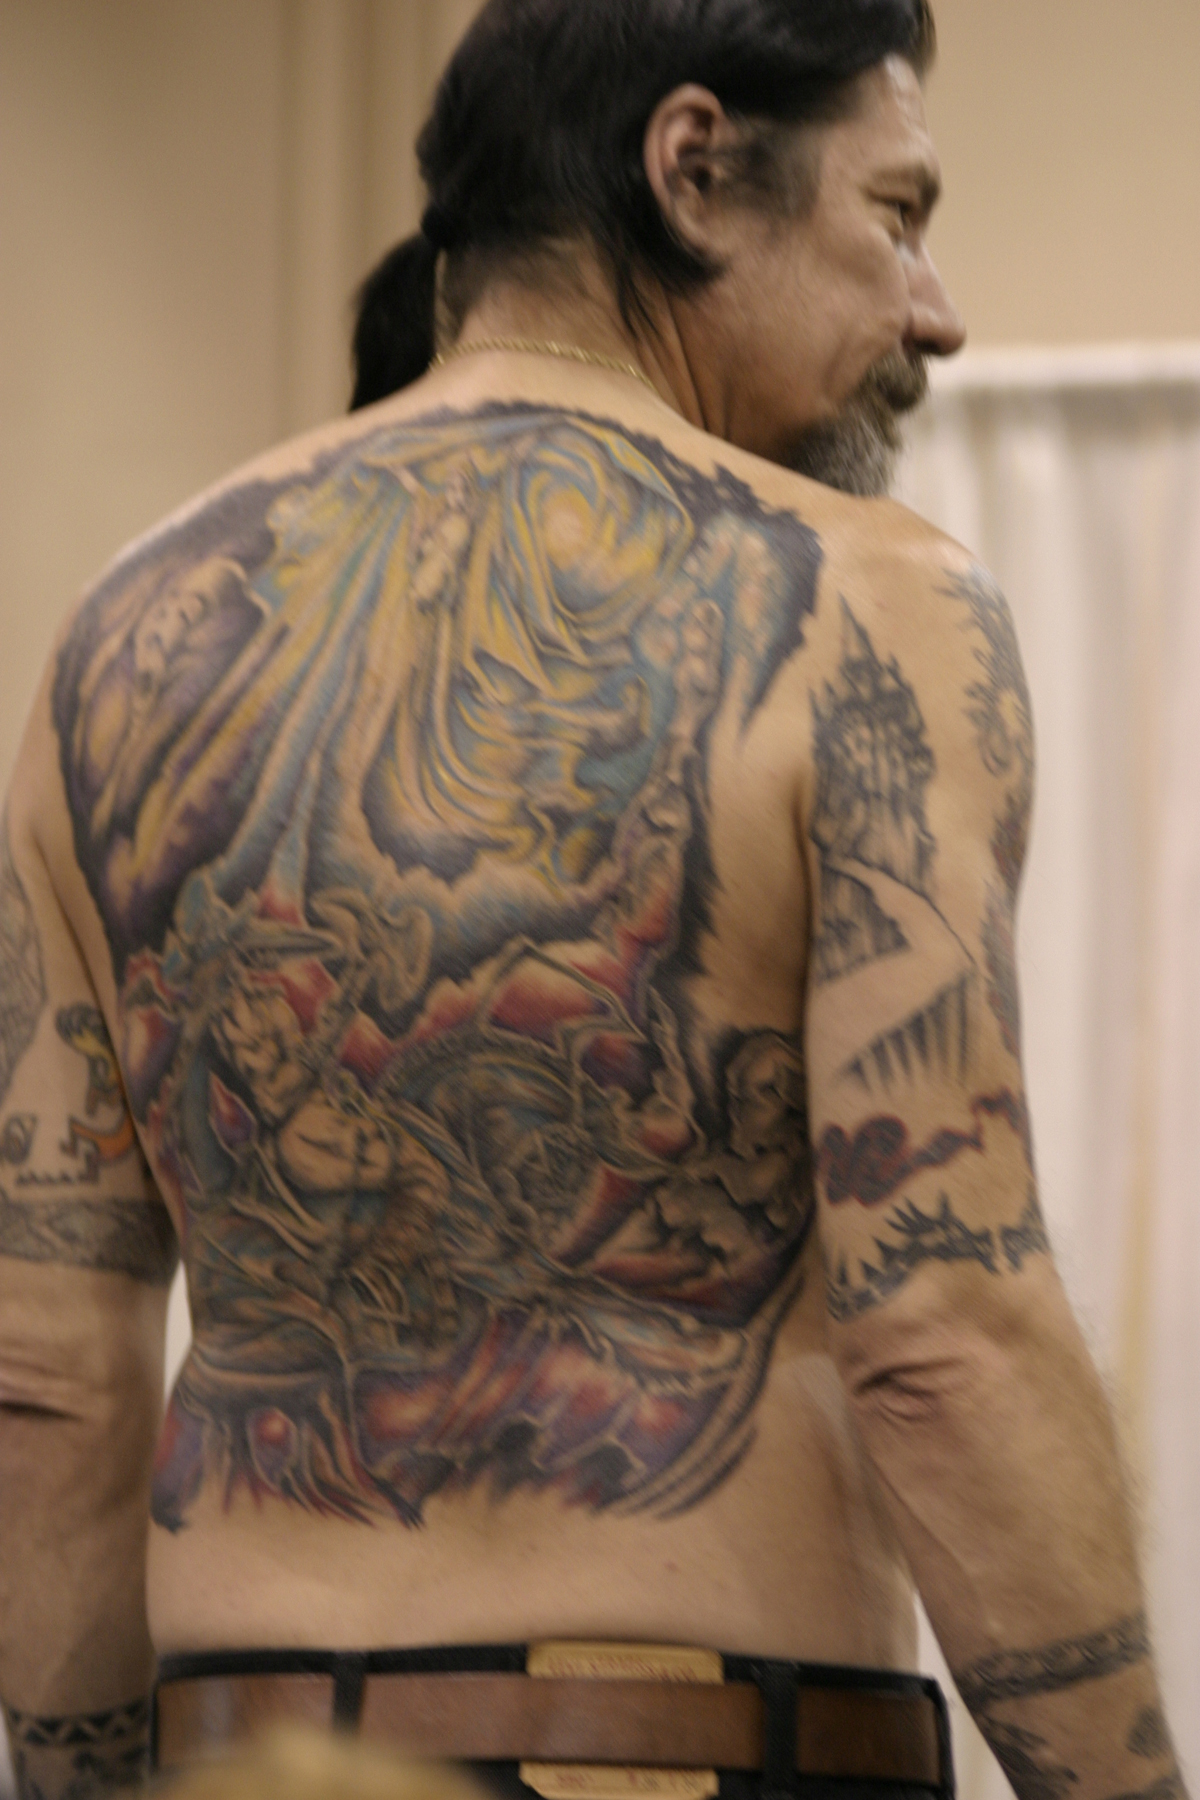 Tattoo_Expo030.JPG